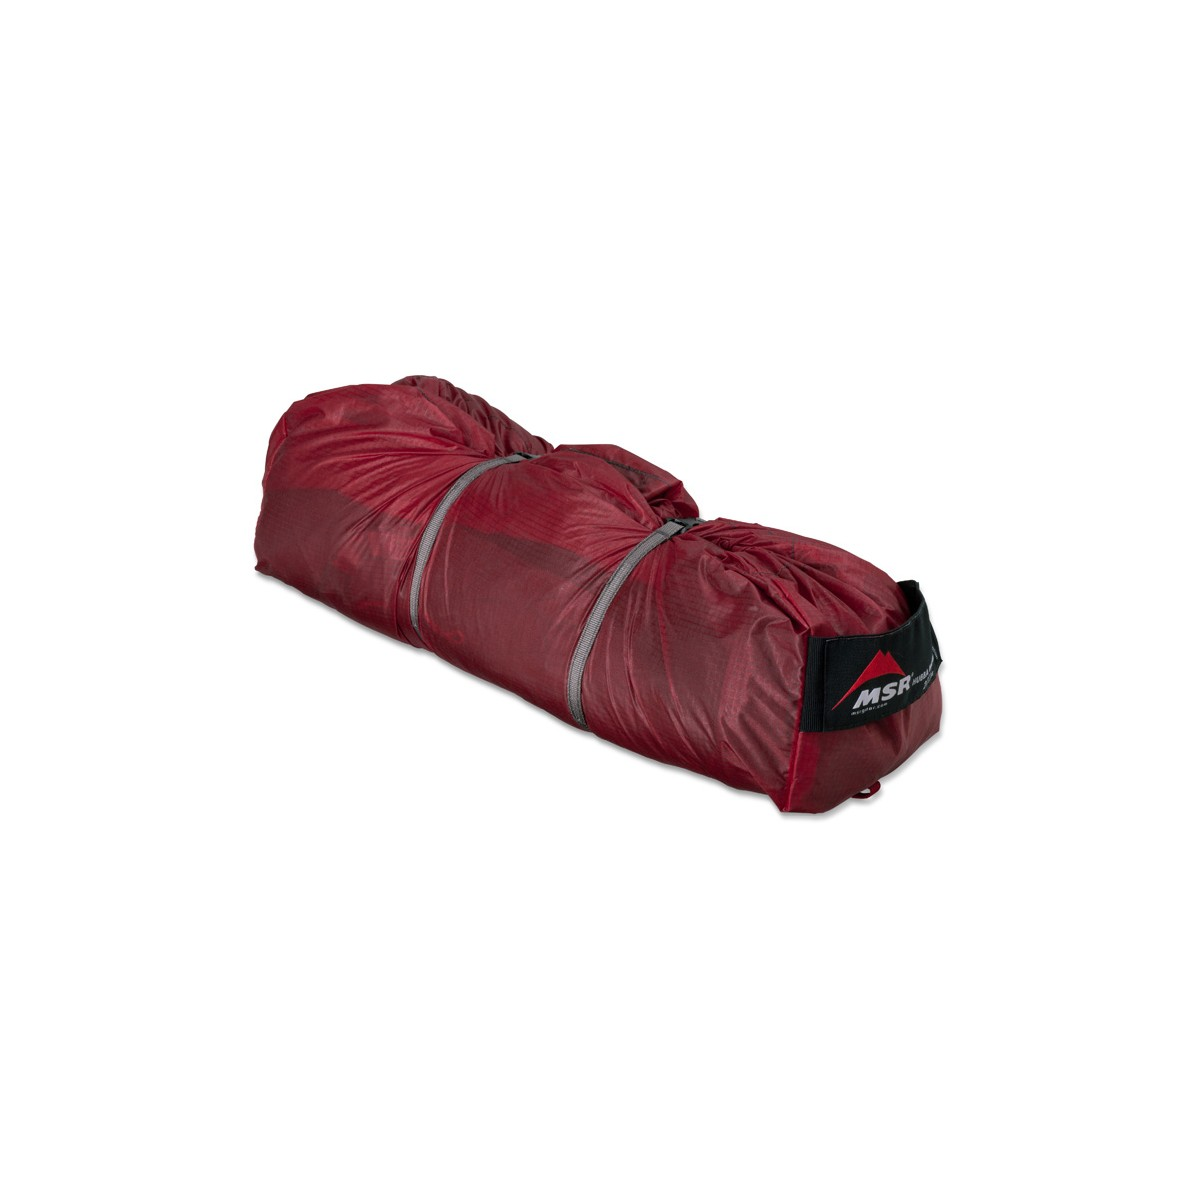 MSR Hubba NX Solo Tente 1 Personne 3 Saisons